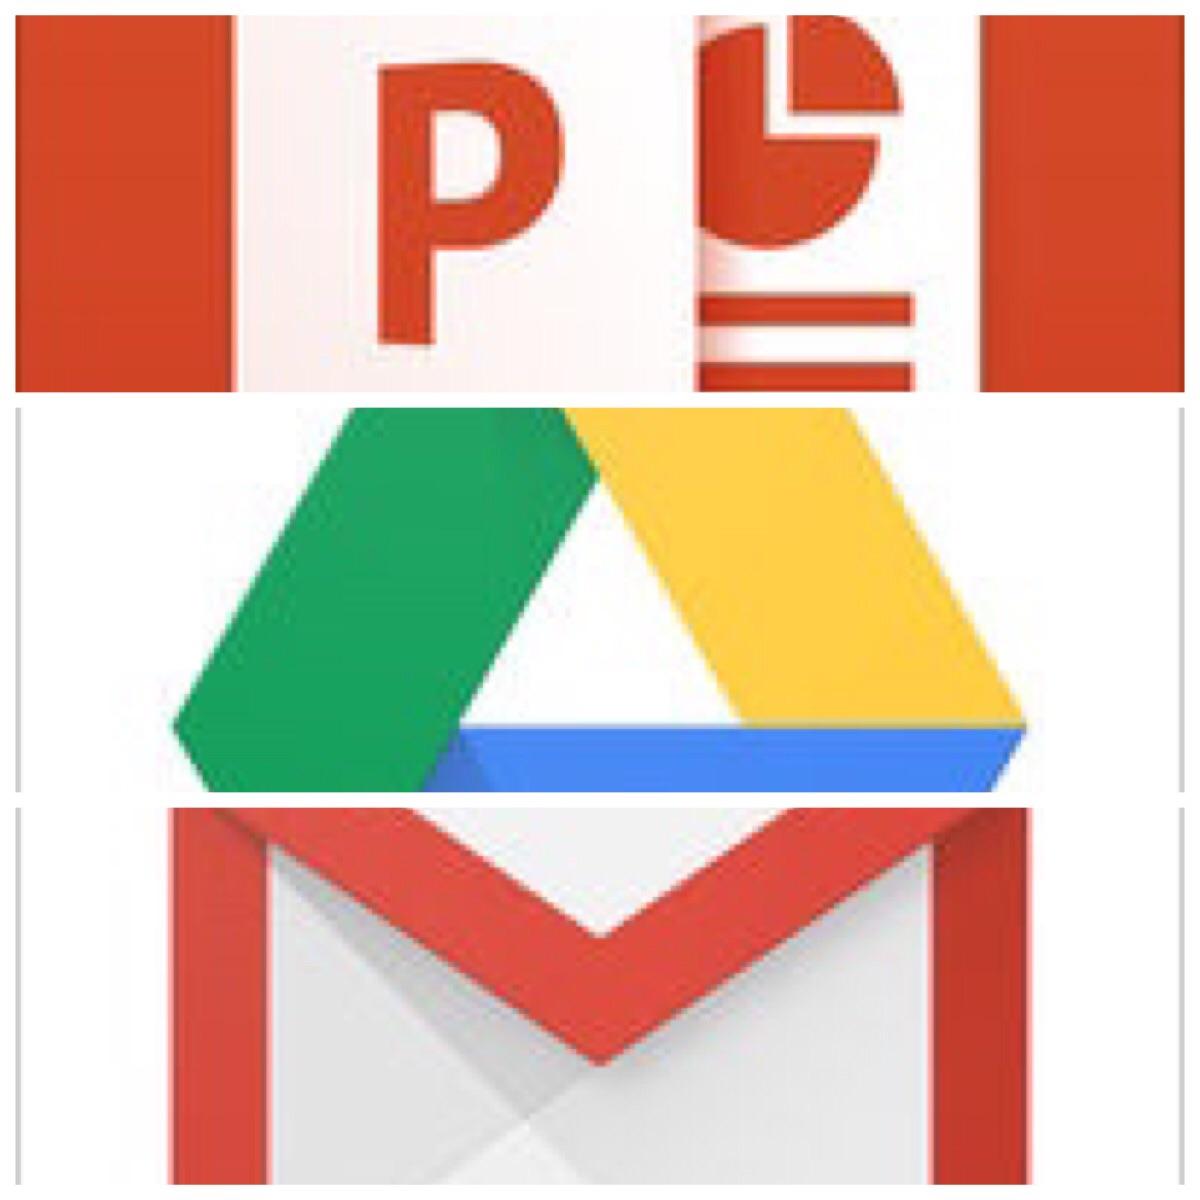 powerpointをpdfに変換しgoogledriveに保存した後 リンクurlをメールで